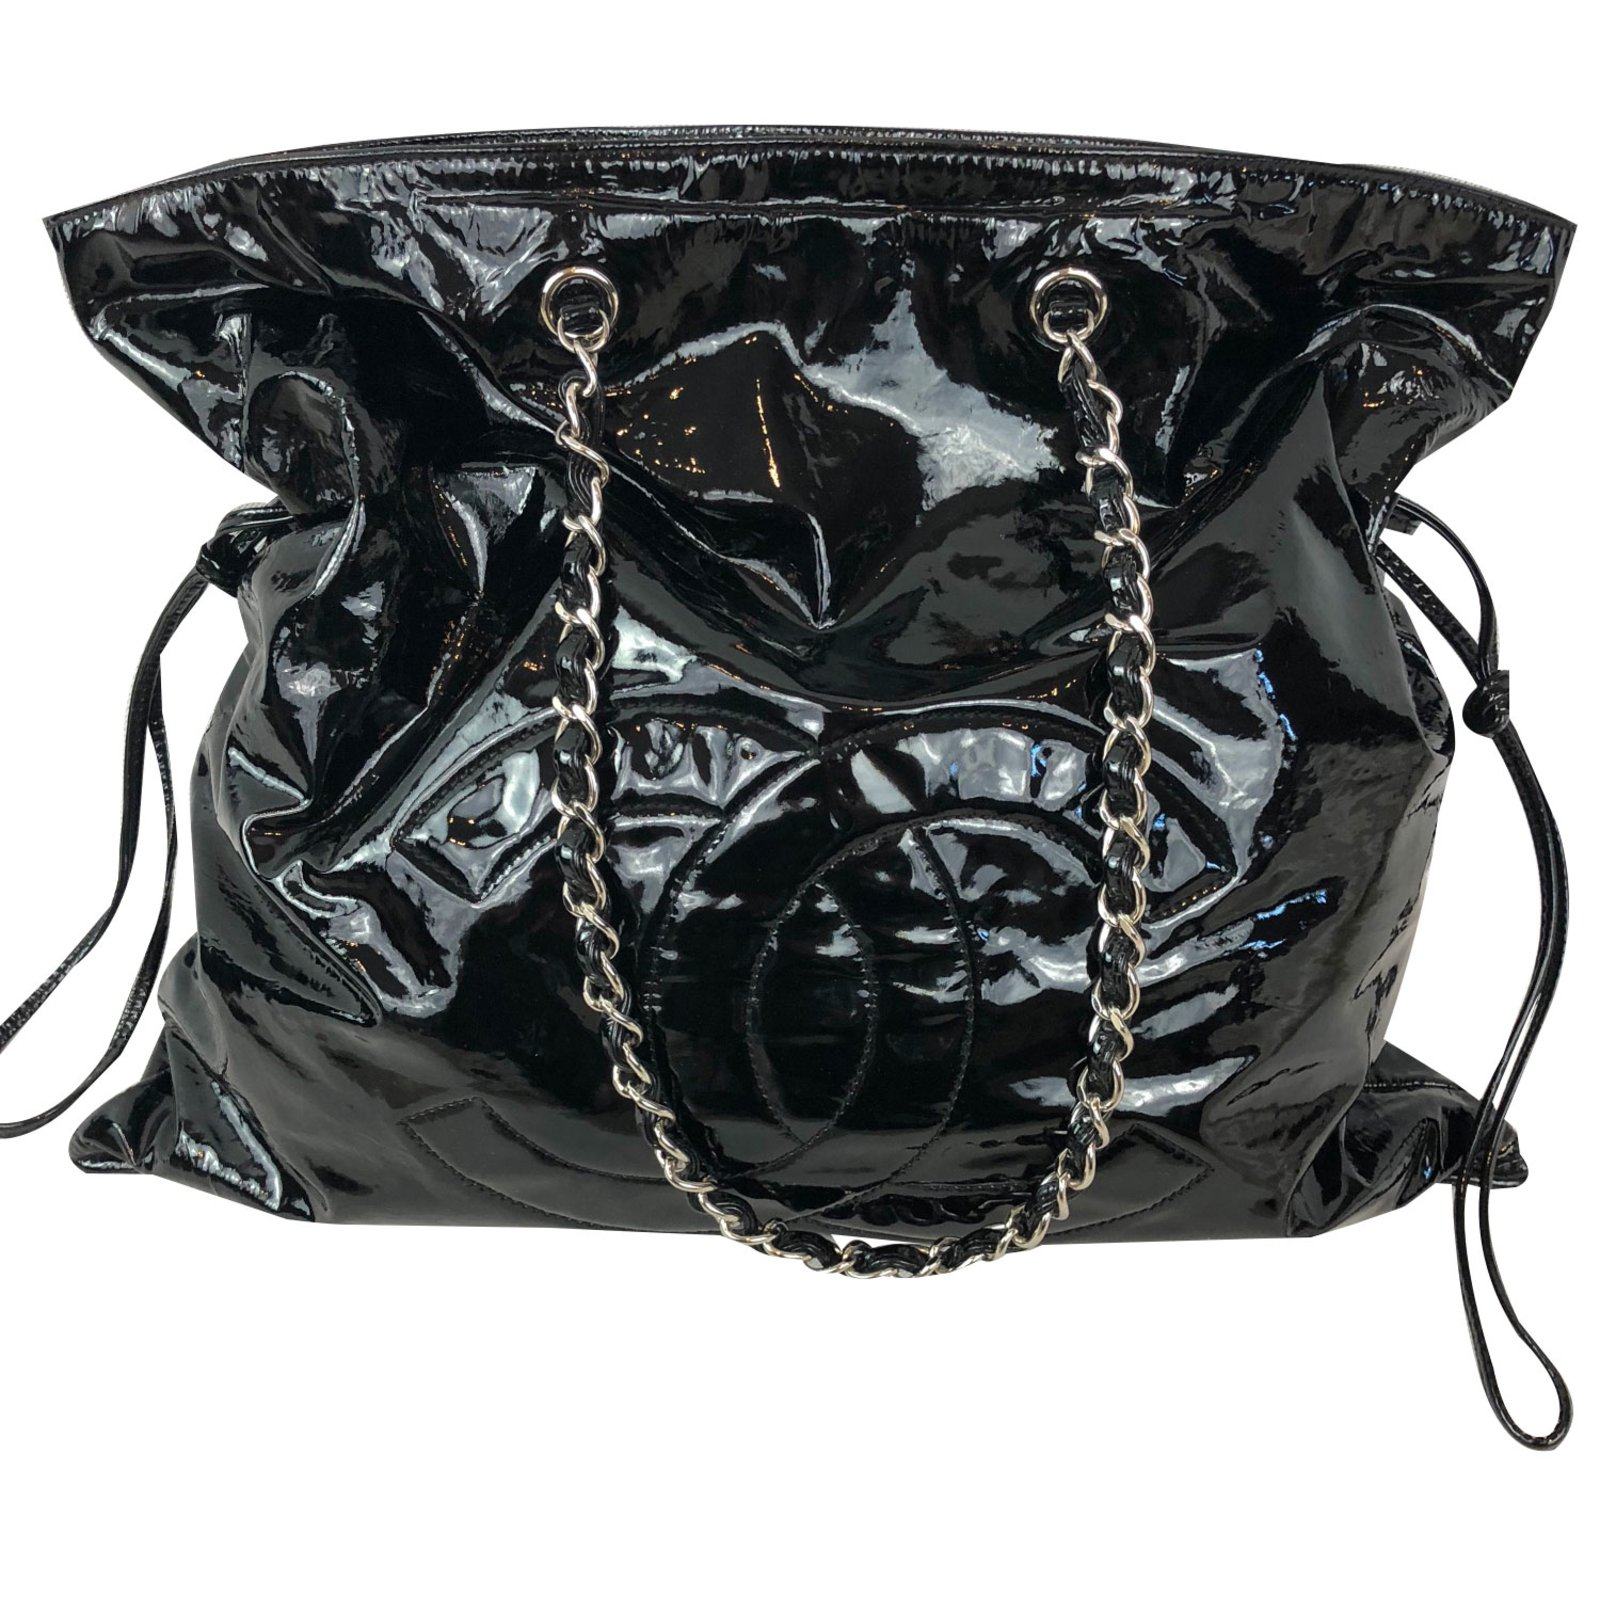 57d6ee3df3 Sacs à main Chanel Grand shopping Cuir vernis Noir ref.83317 - Joli ...